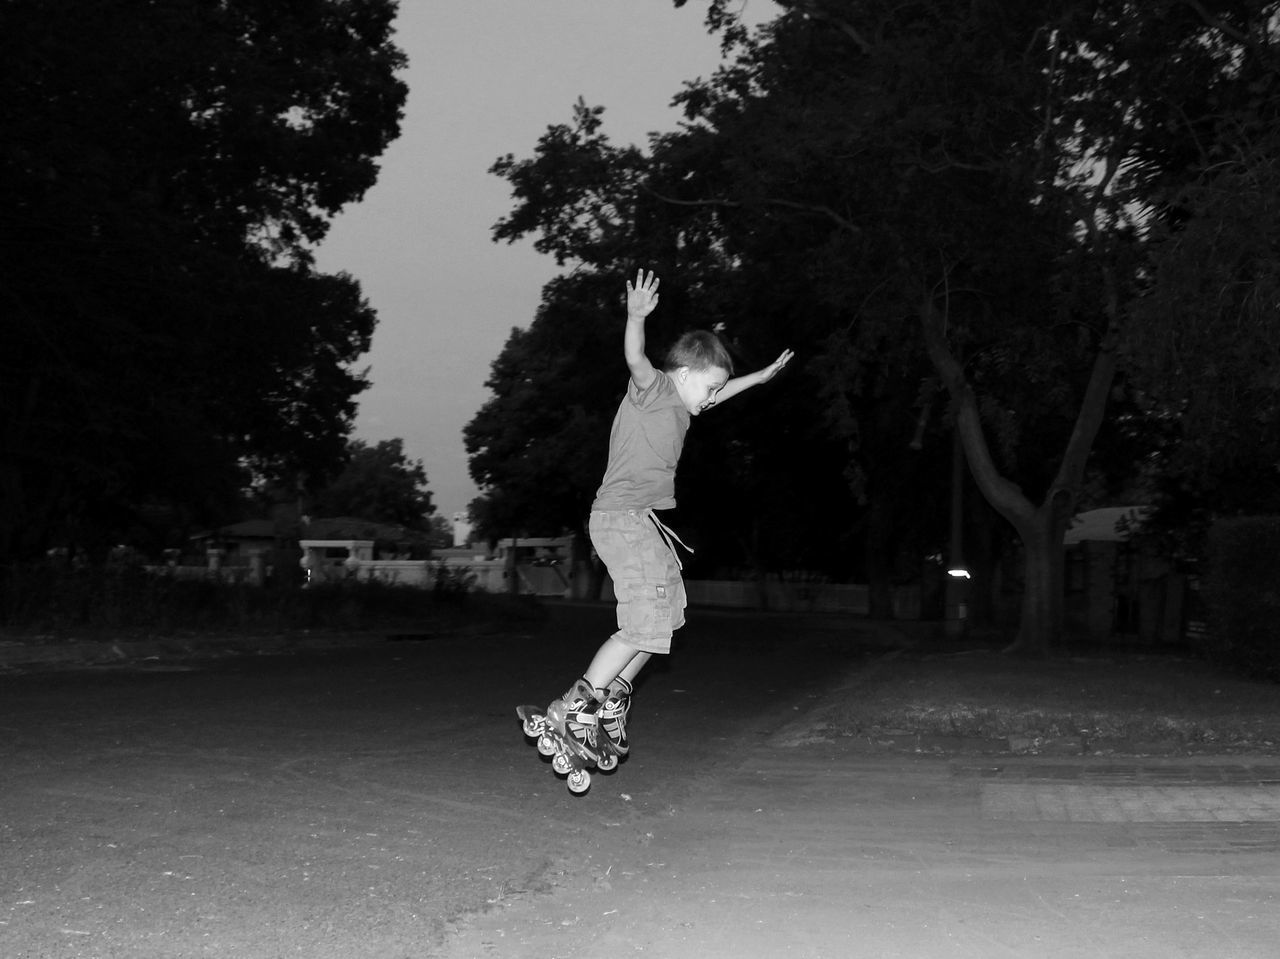 Boy Jumping While Roller Skating On Road At Night